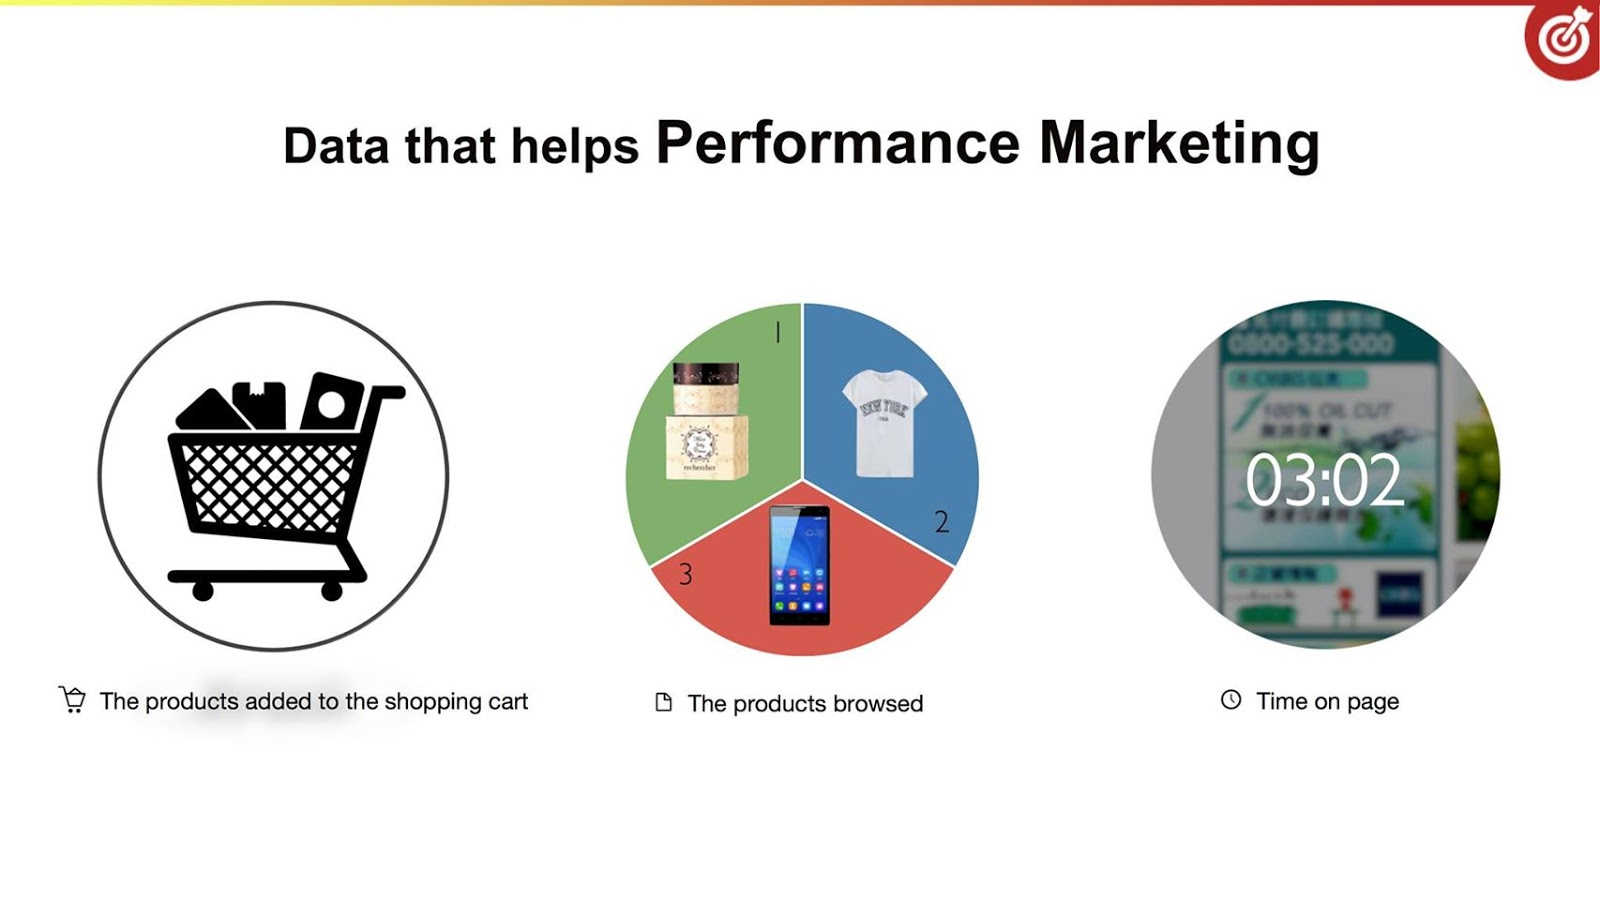 Những hiểu lầm phổ biến về Performance Marketing marketingreview.vn 2